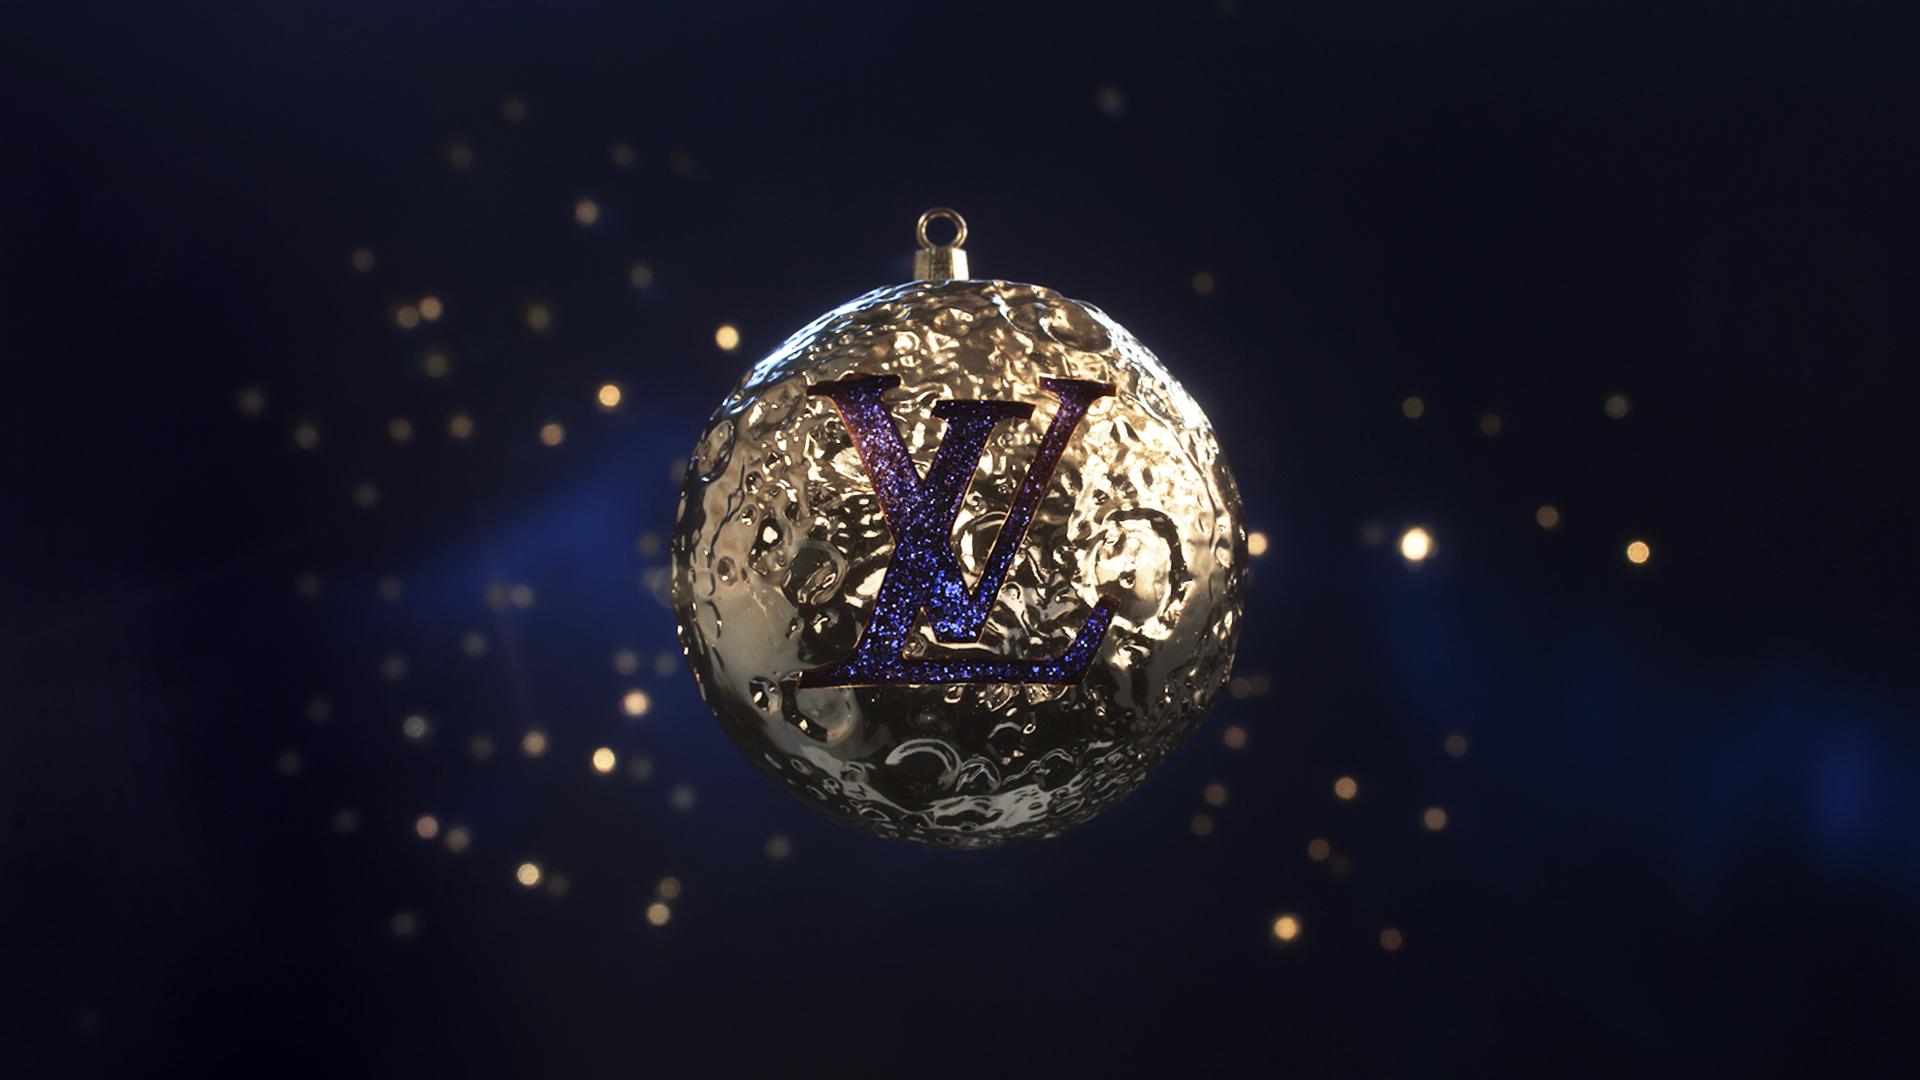 LV-Holiday-Campaign-Animation Grid 1920x1080.jpg